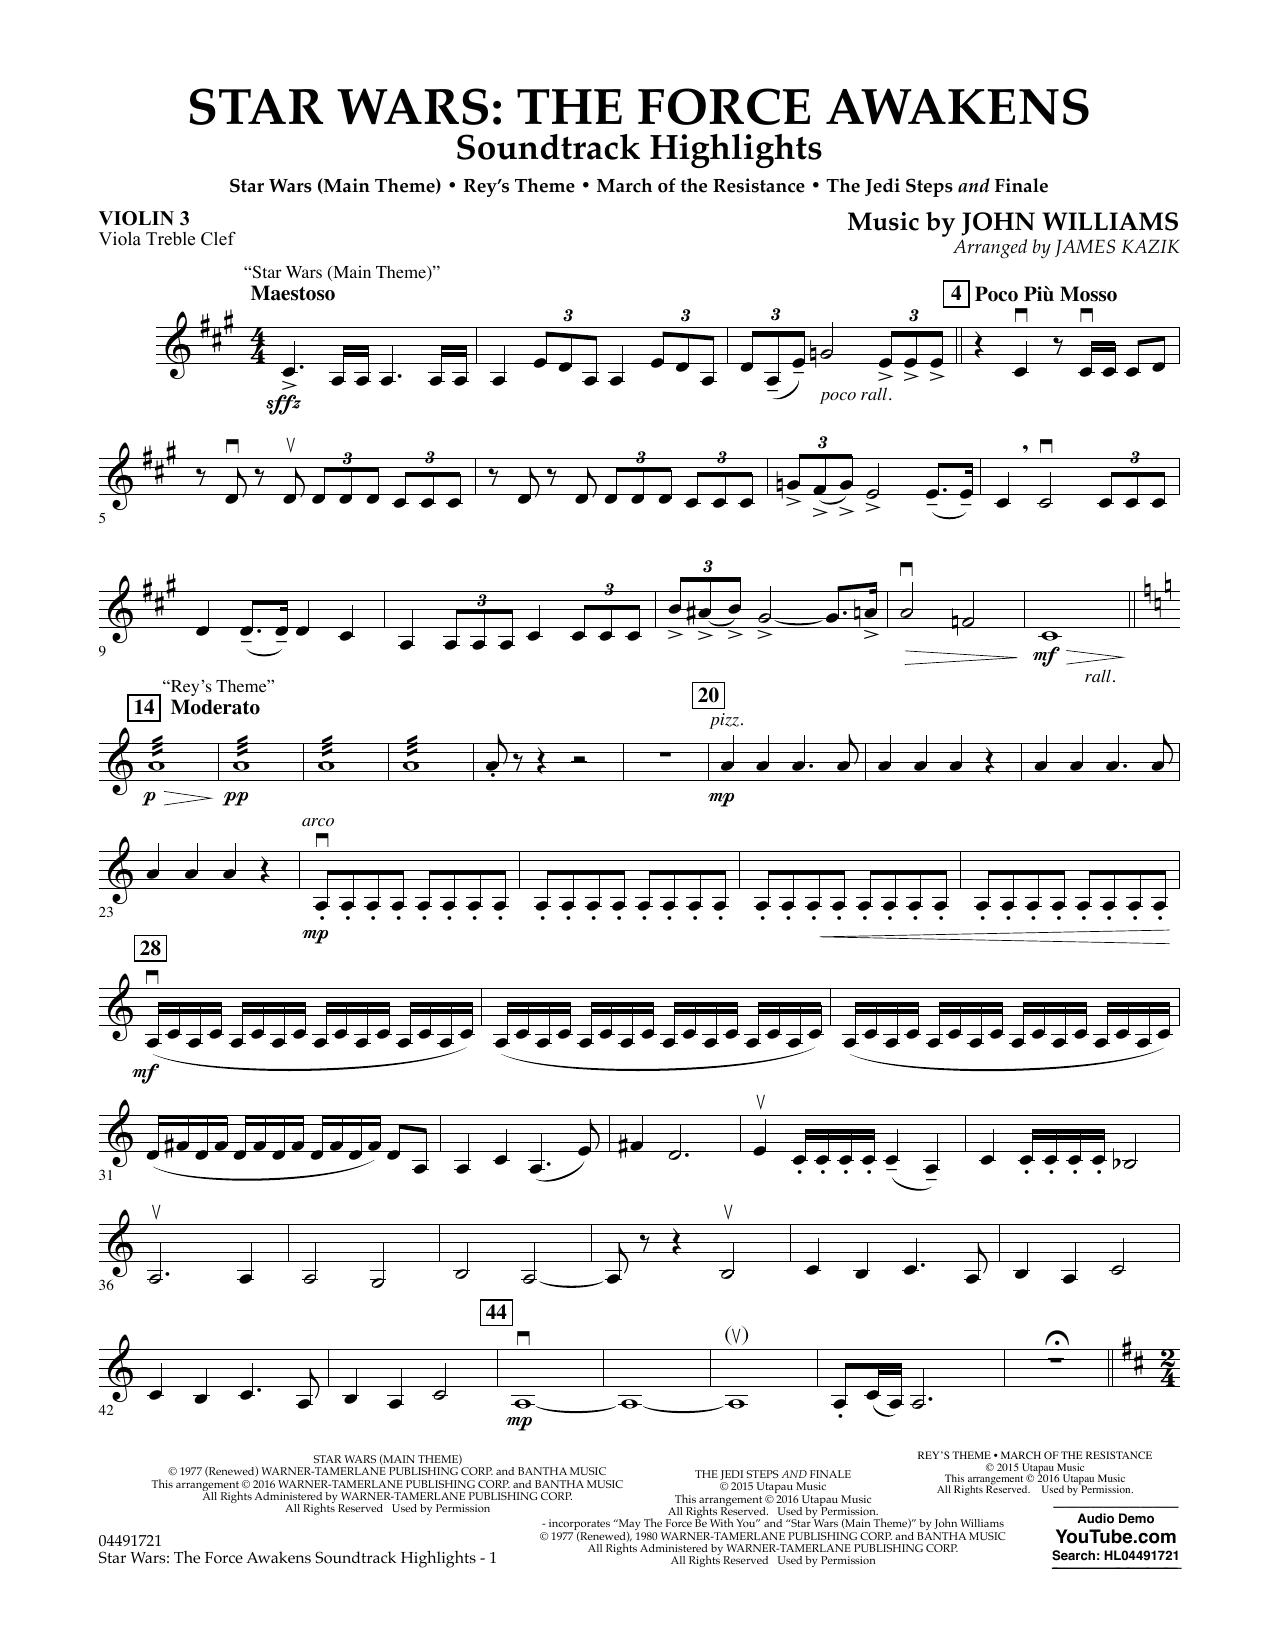 John Williams - Star Wars: The Force Awakens Soundtrack Highlights - Violin 3 (Viola Treble Clef)